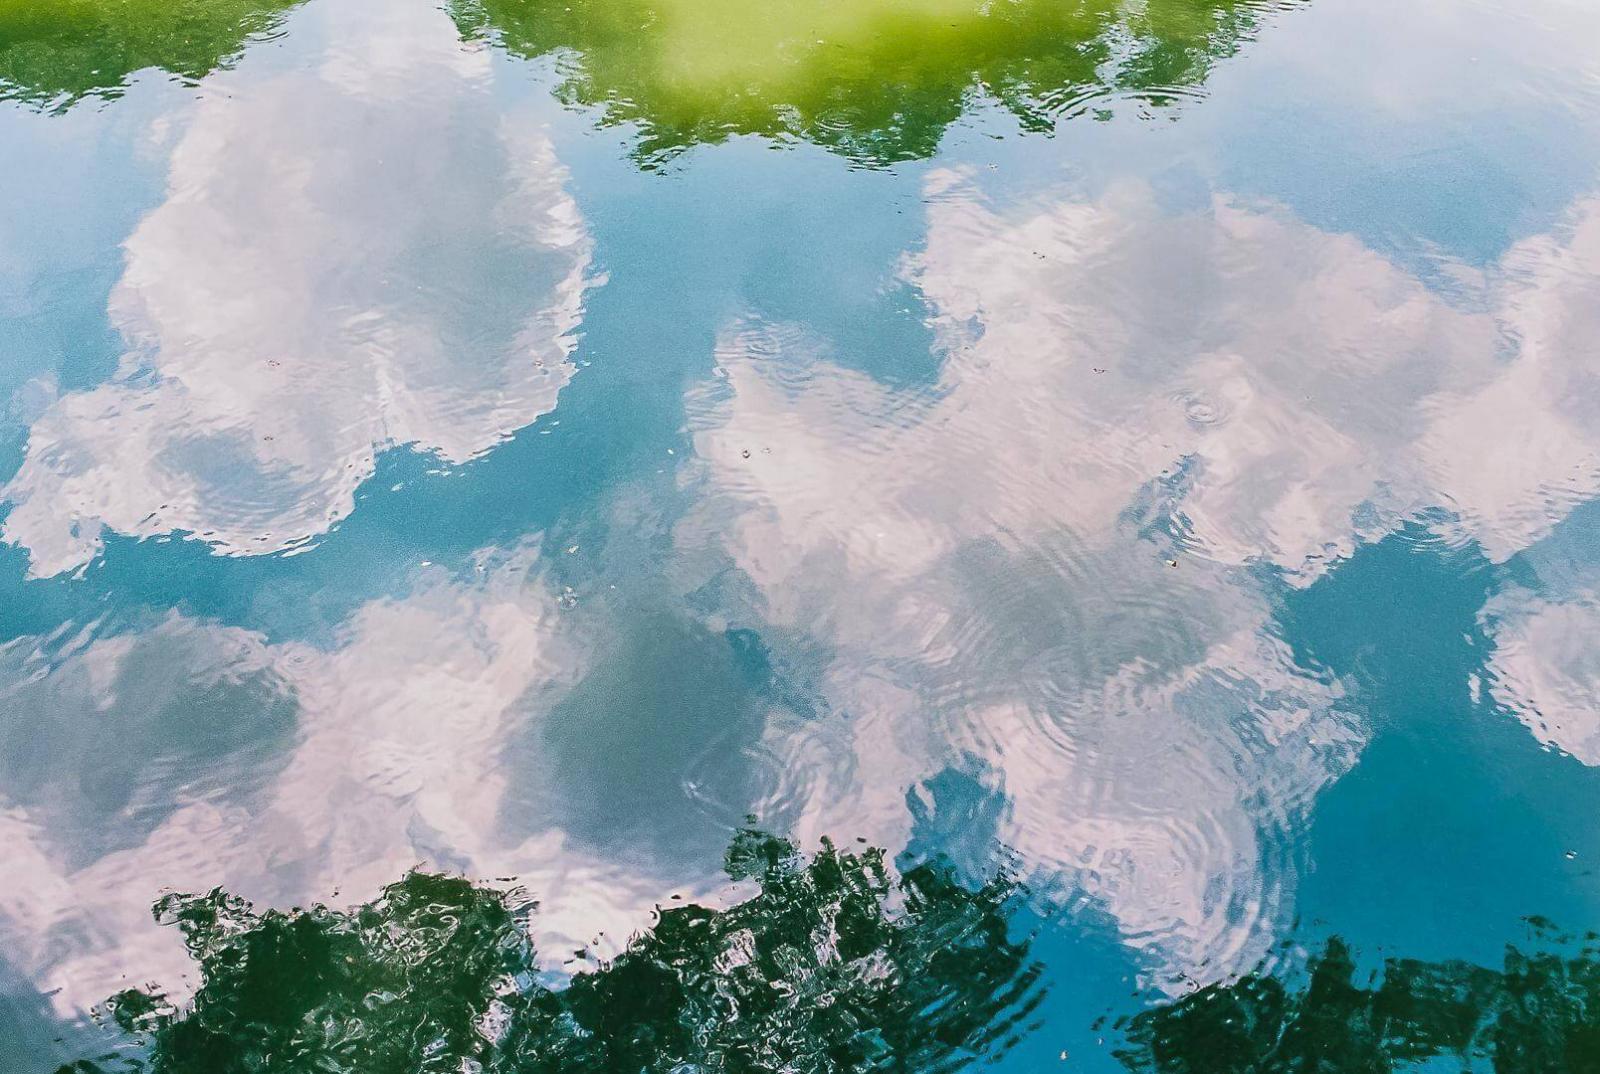 Photography image - Loading Bryce_illusion(2)_(1).jpg